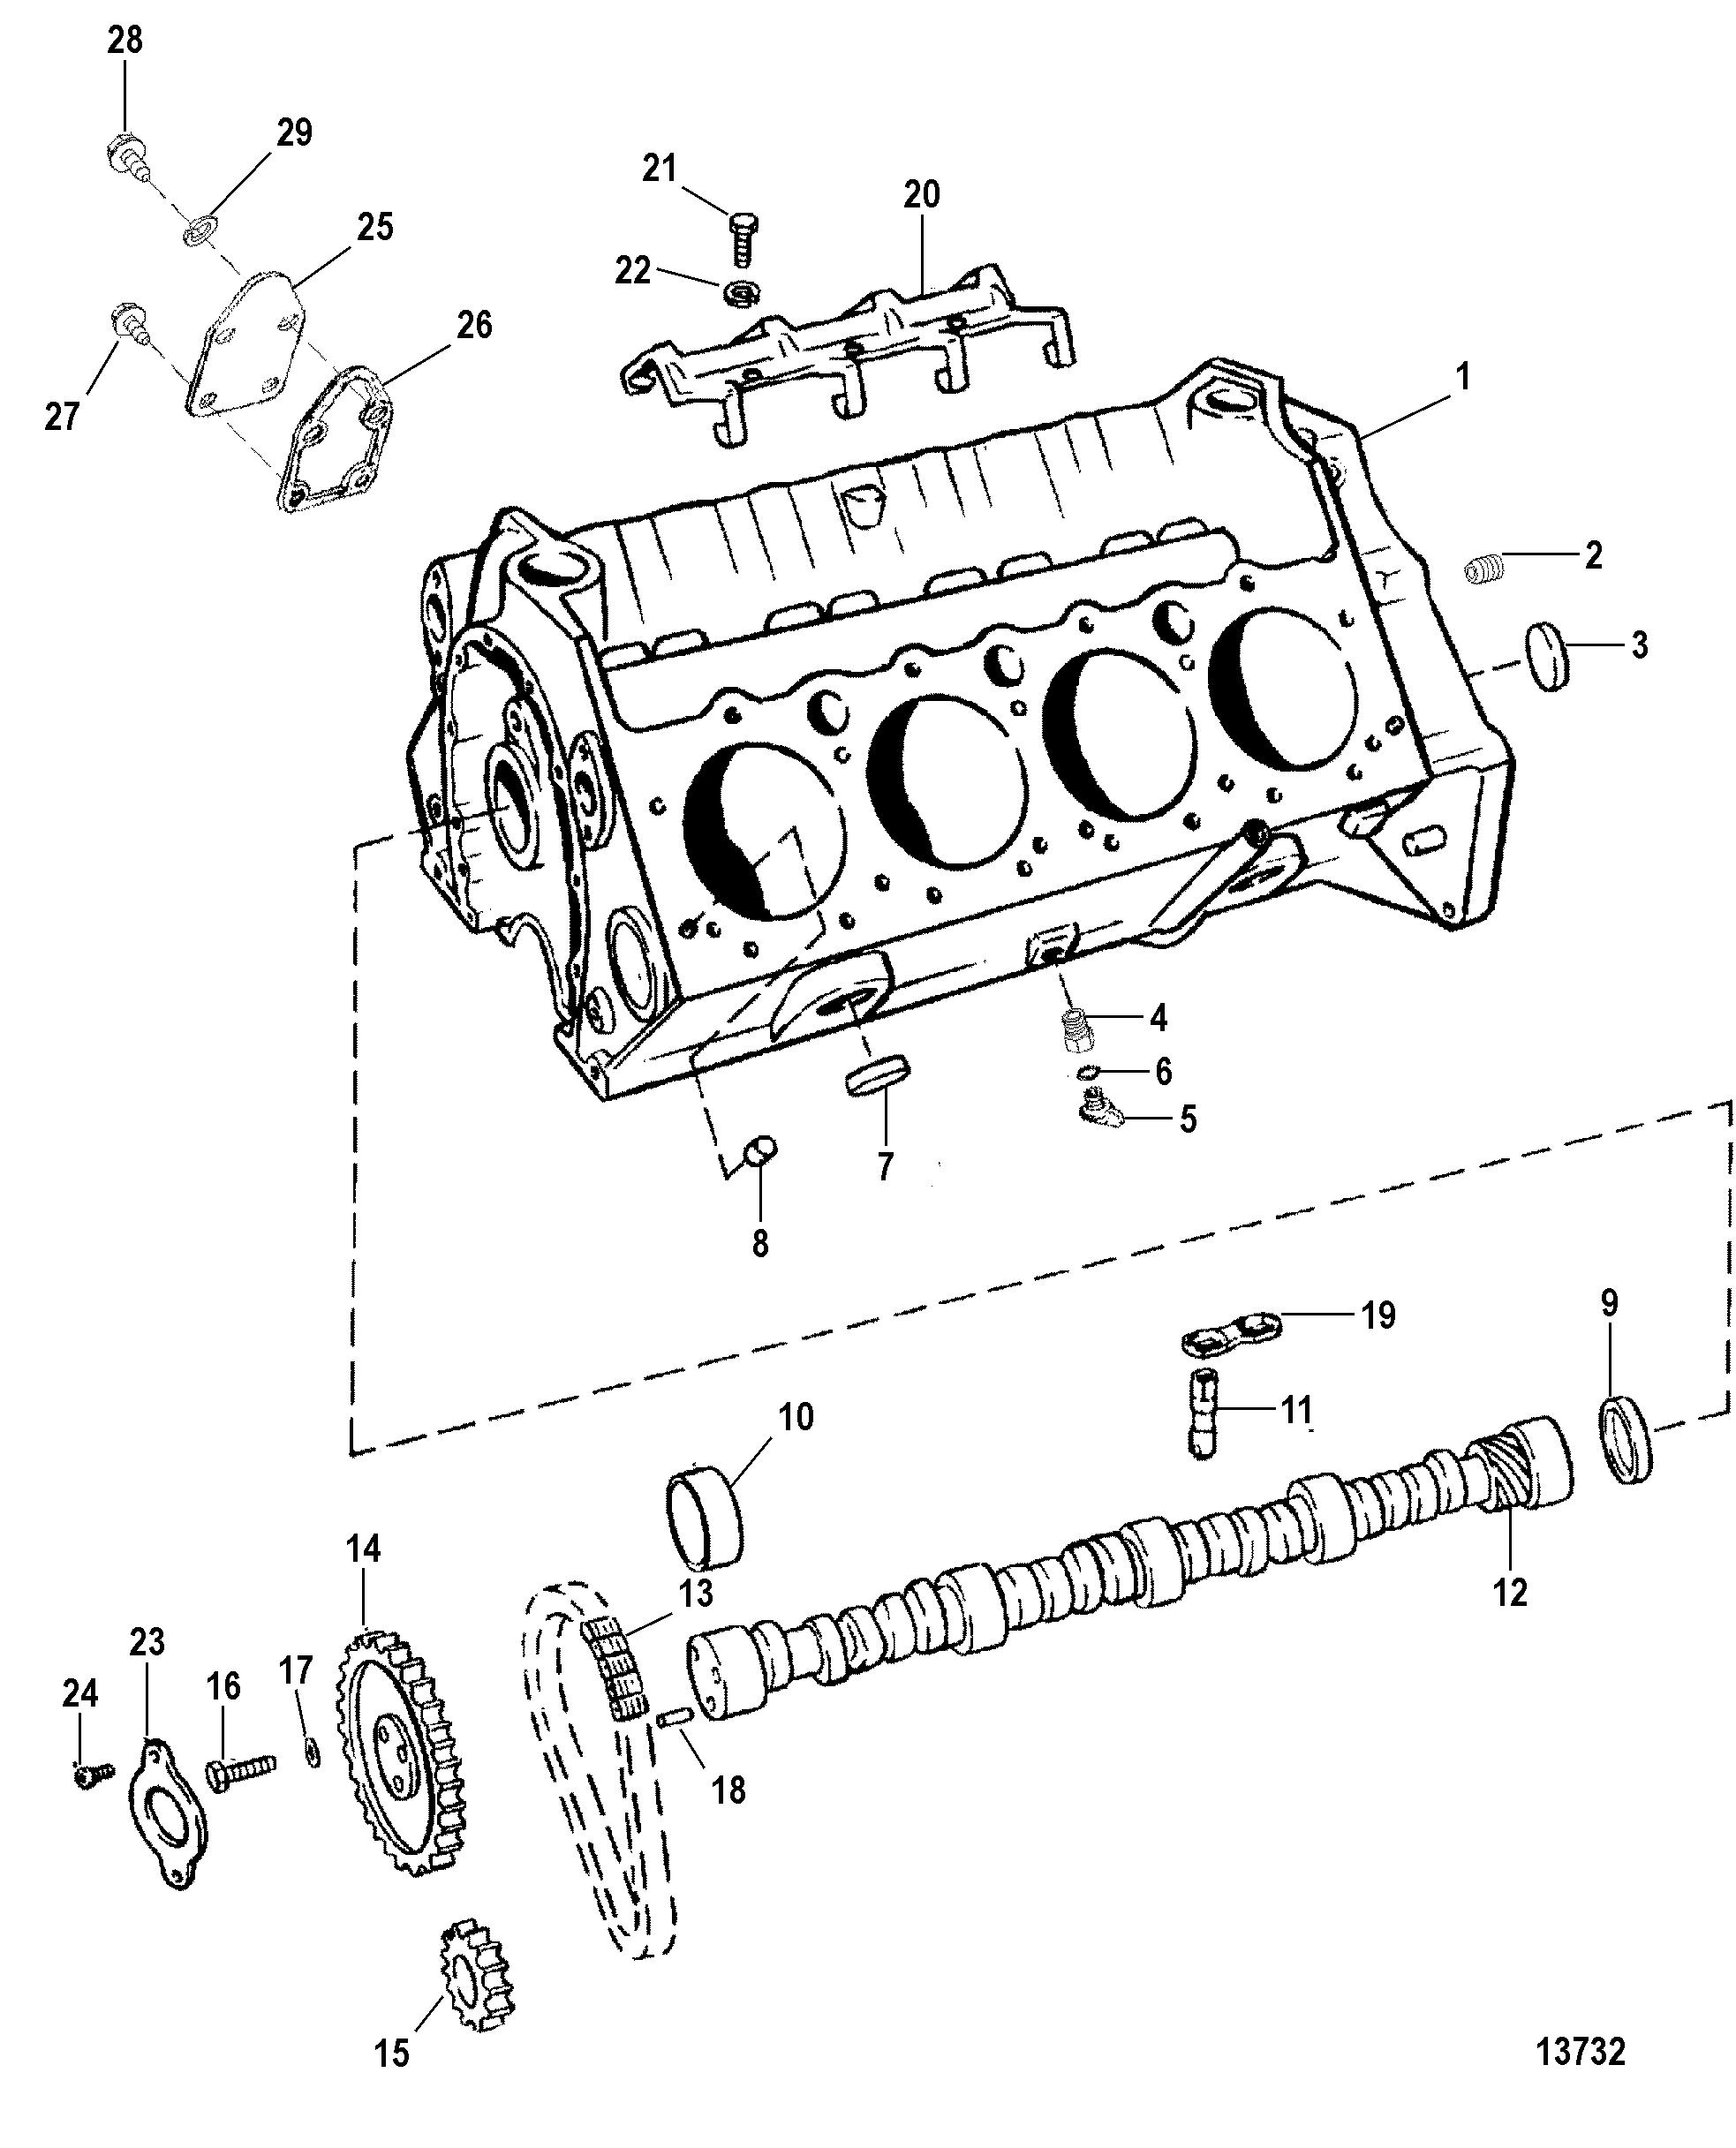 5.7L EFI (2 BBL.-TBI) GM 350 V-8